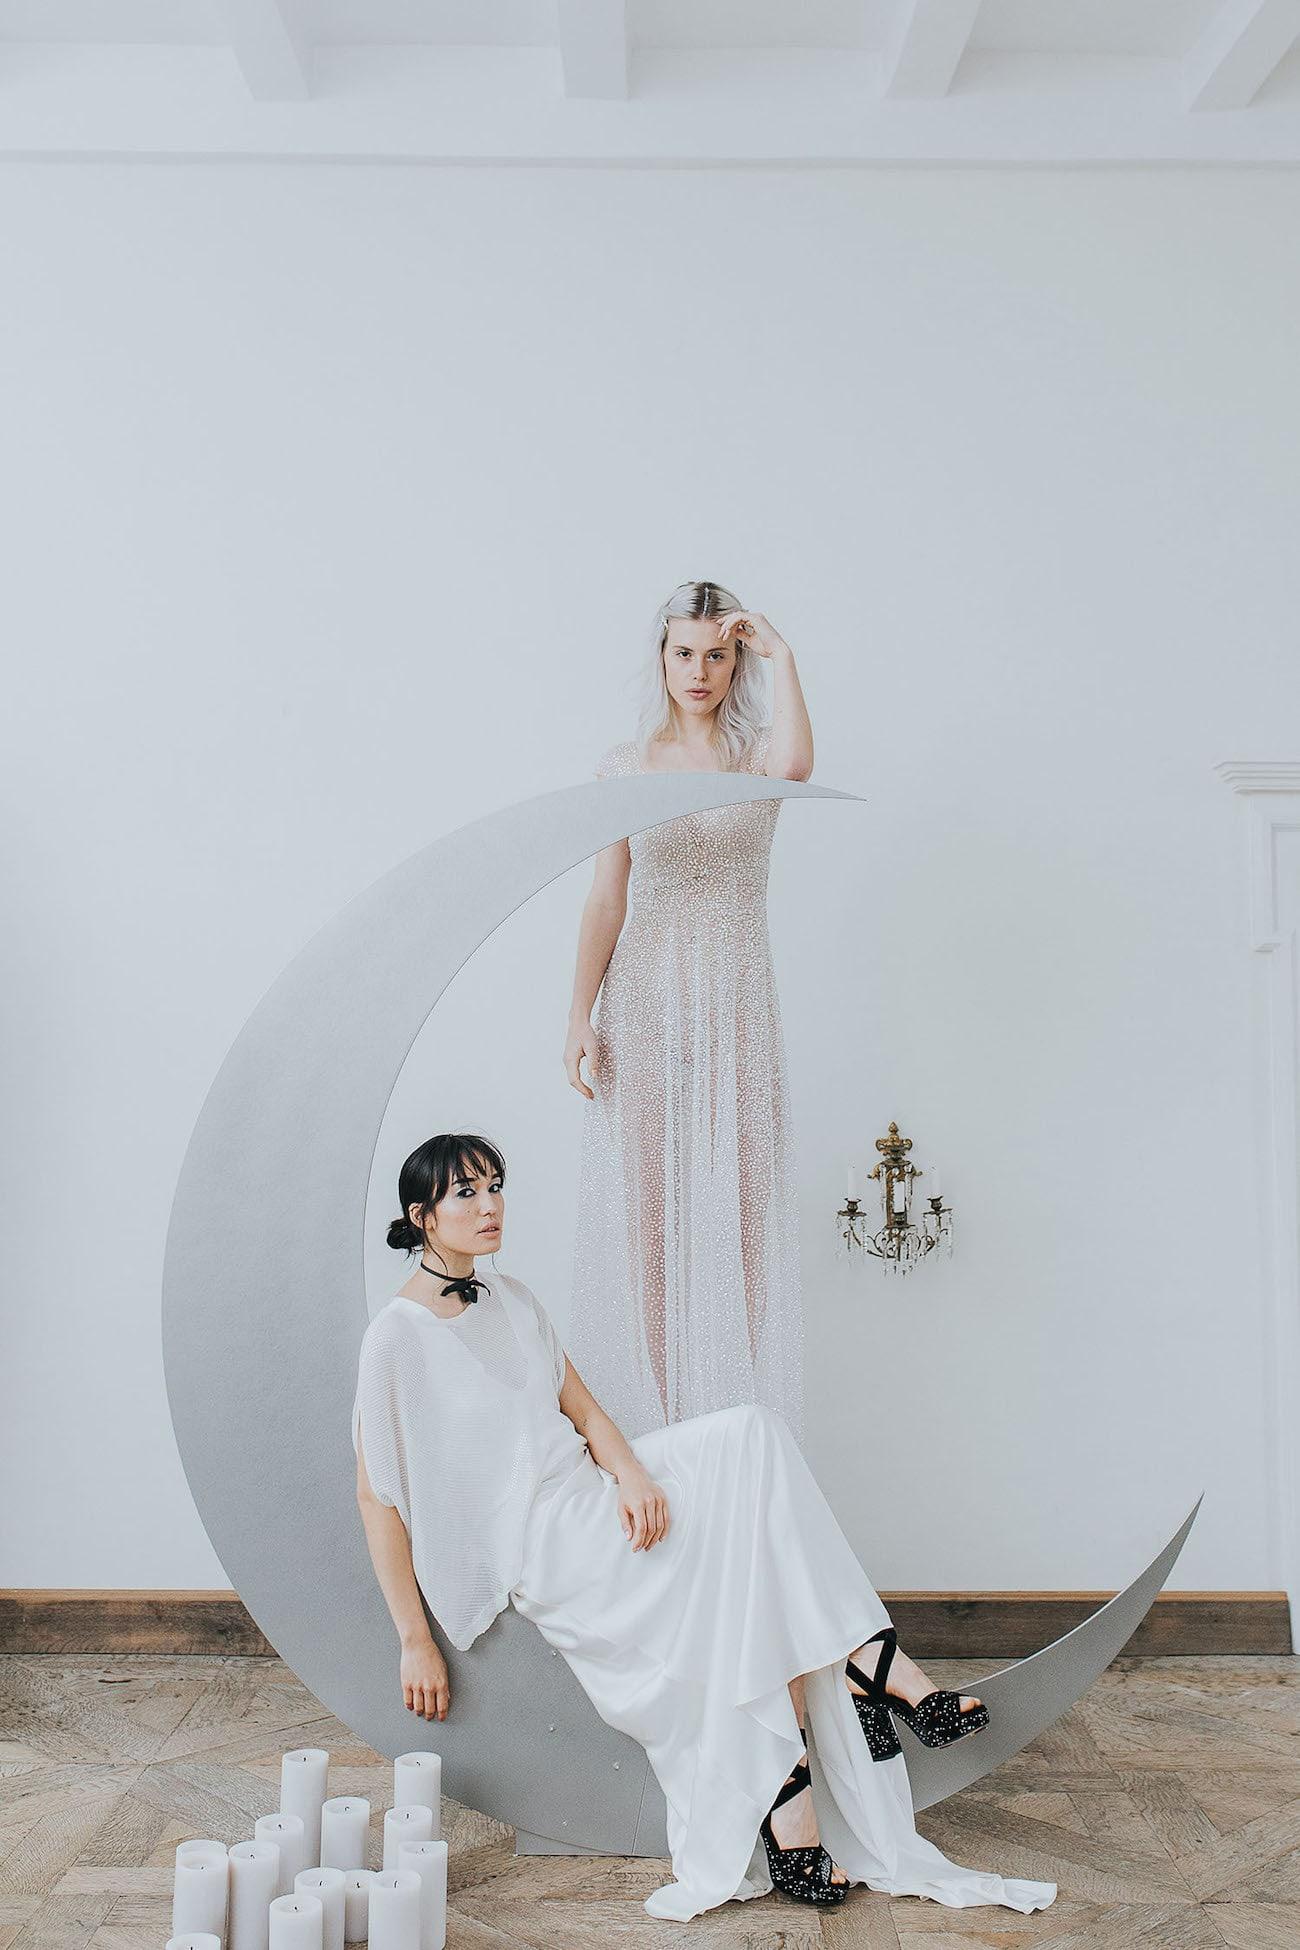 Celestial Romance Bridal Inspiration | Credit: Cornelia Lietz